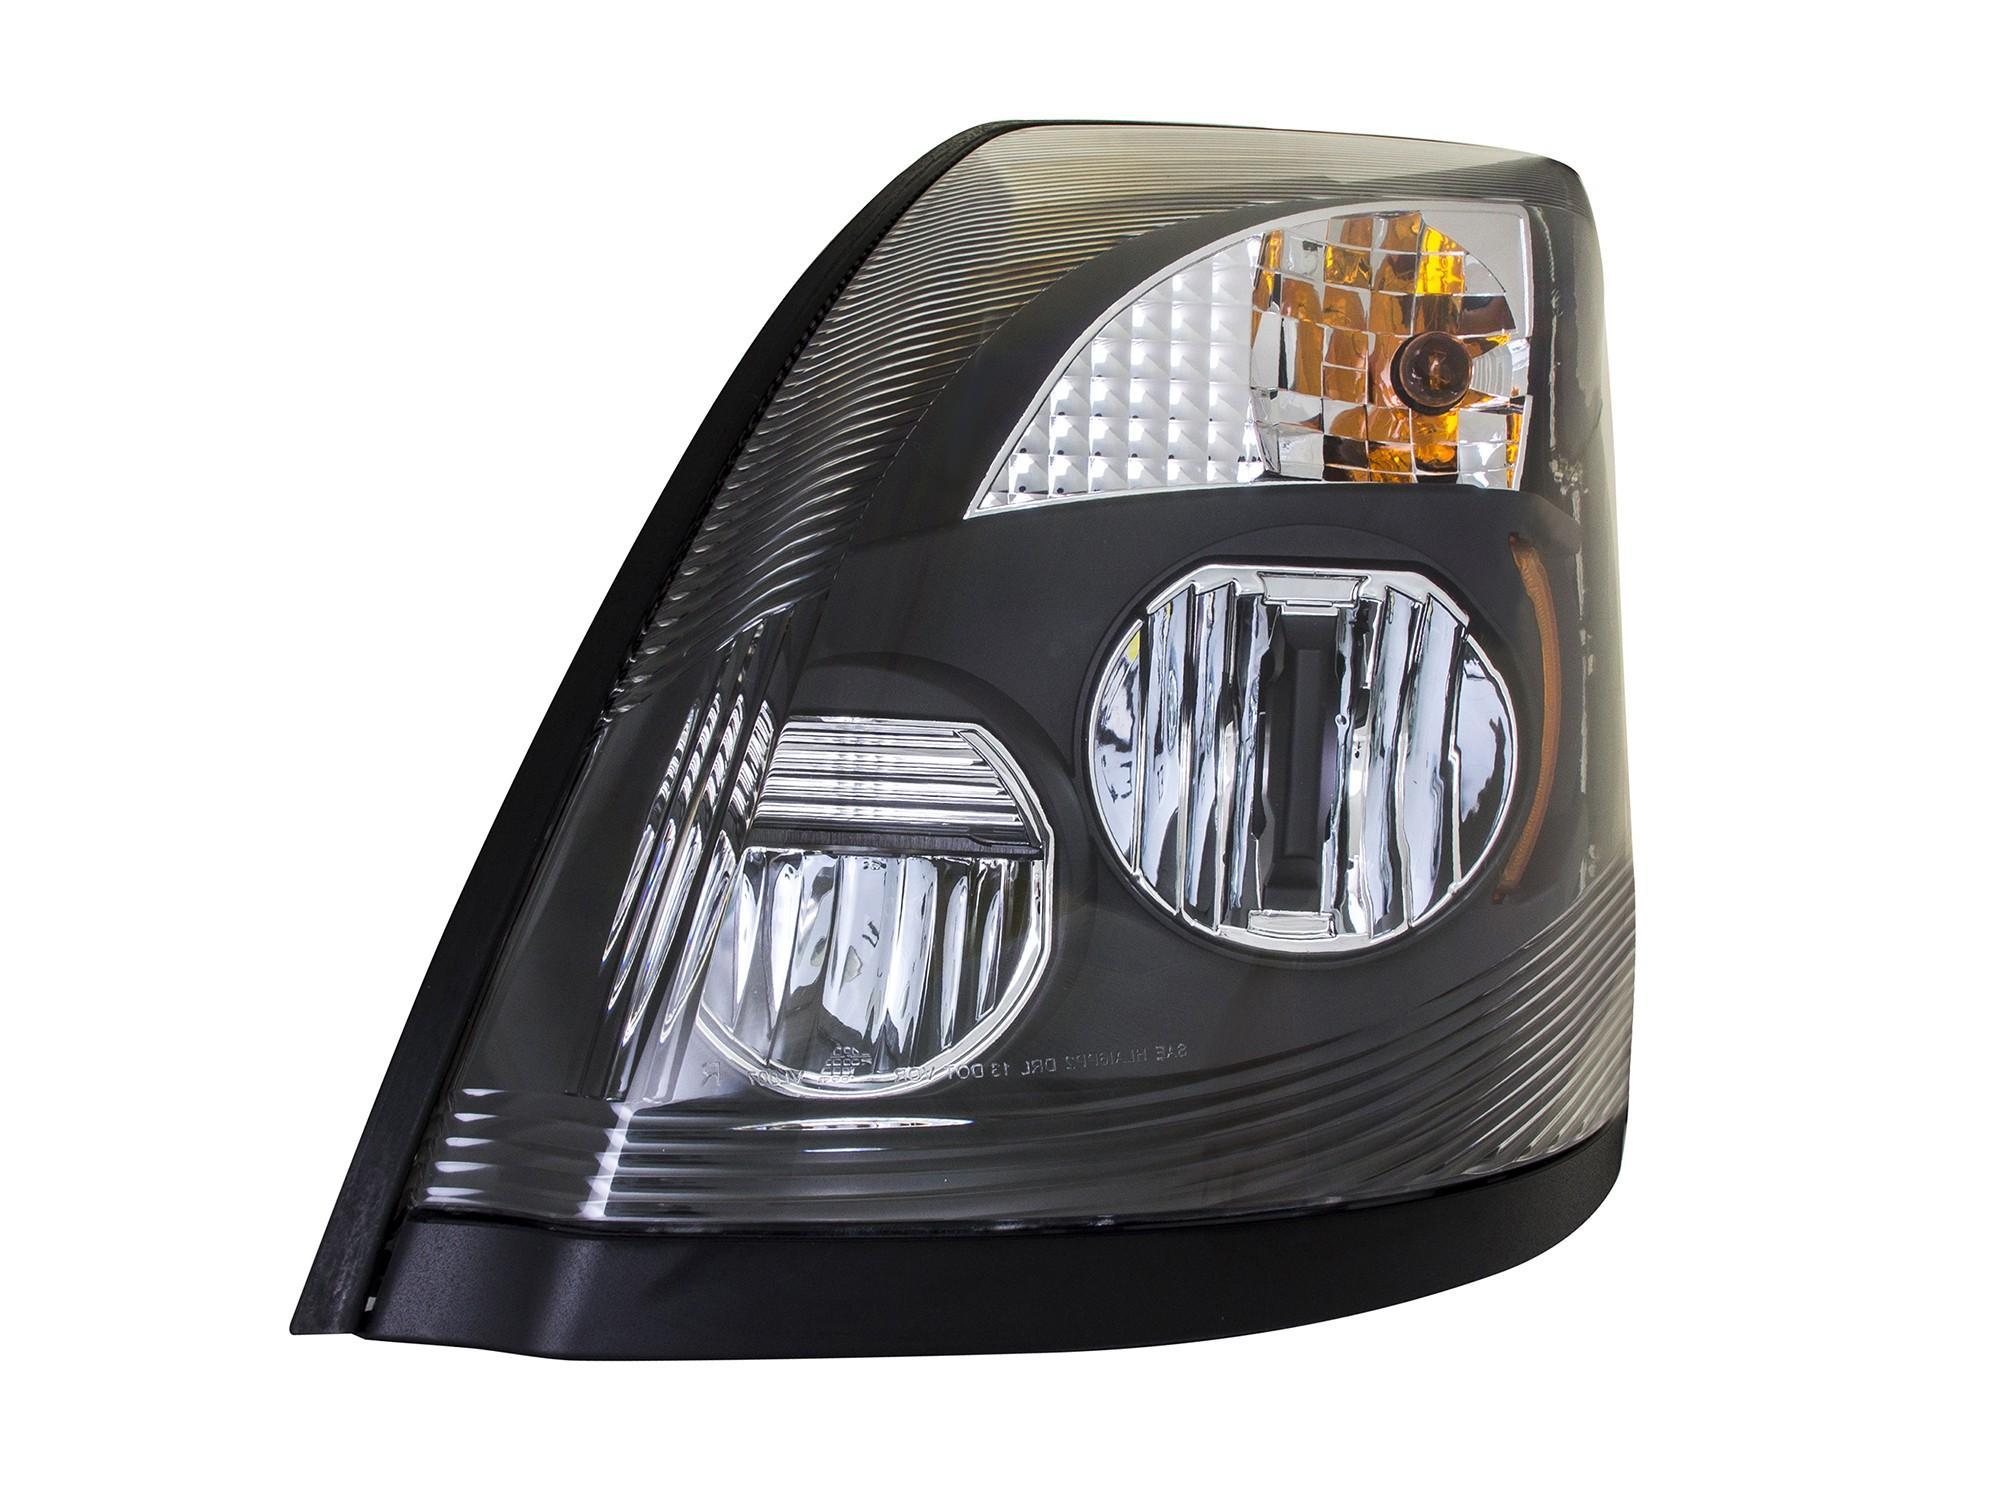 2015 2016 Volvo VNL Headlight LED Front View.